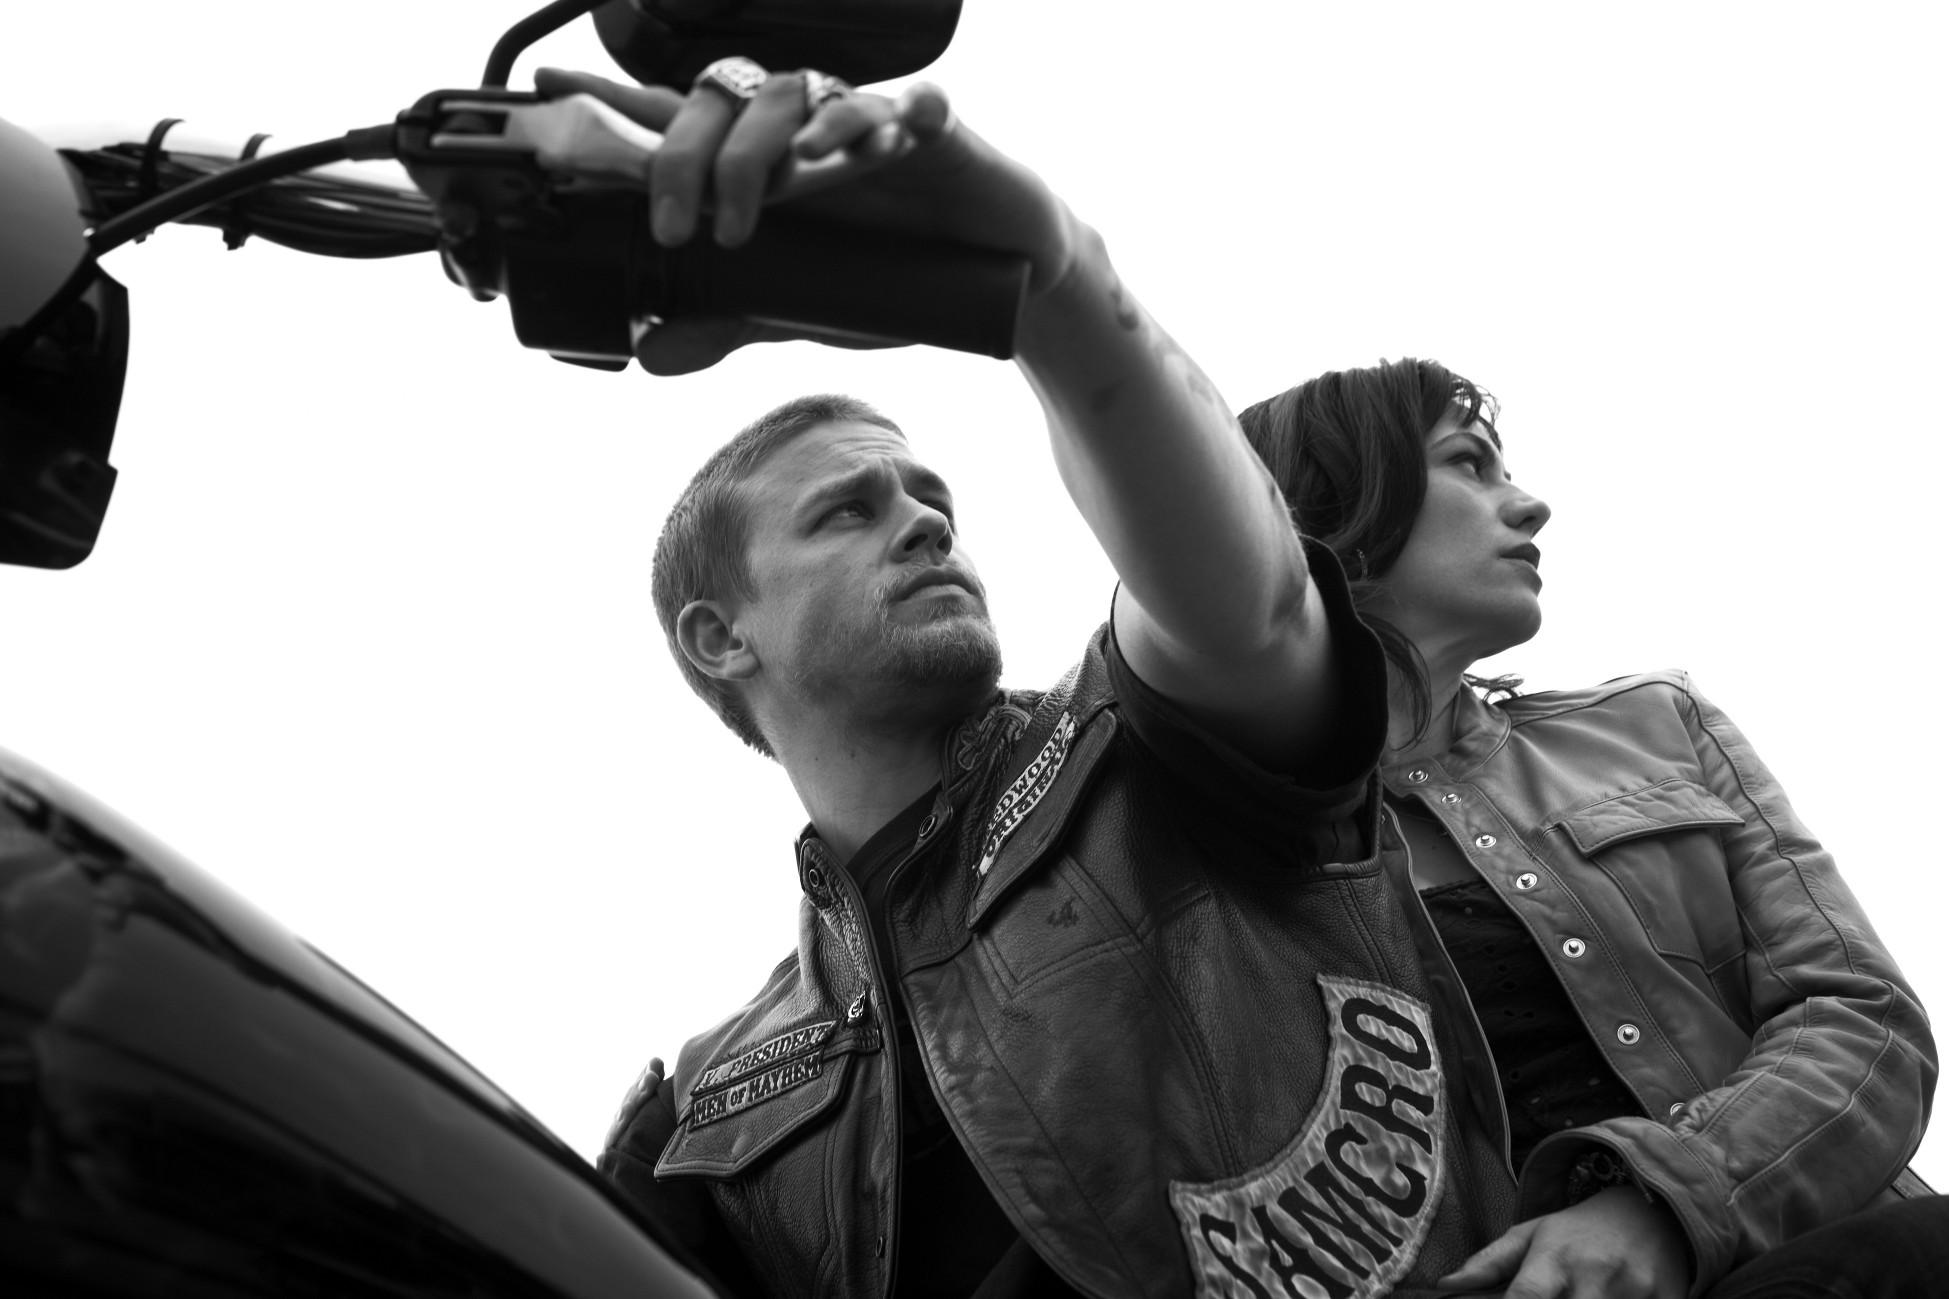 Sons of Anarchy – Jackson 'Jax' Teller (Charlie Hunnam) Tara Knowles  (Maggie Siff) Season 4